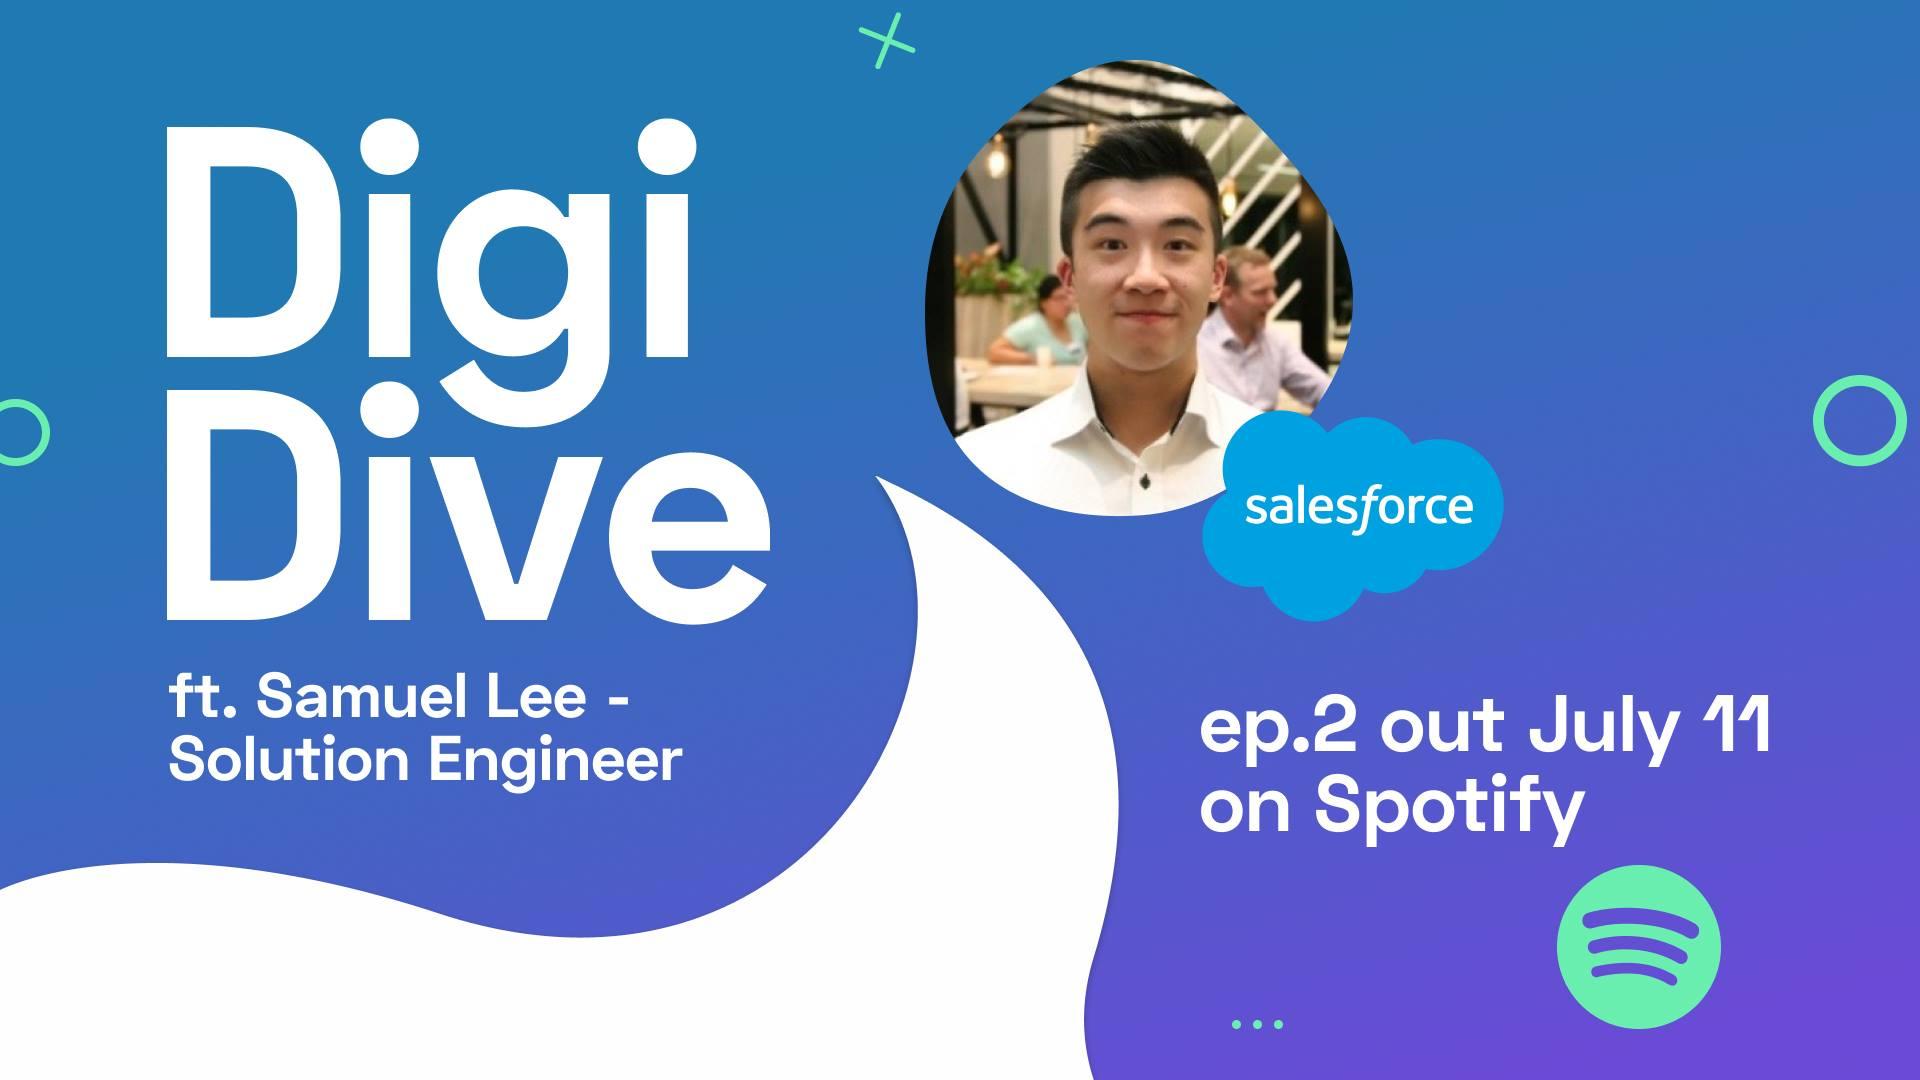 DigiDive Episode #2: Solution Engineer with Samuel Lee